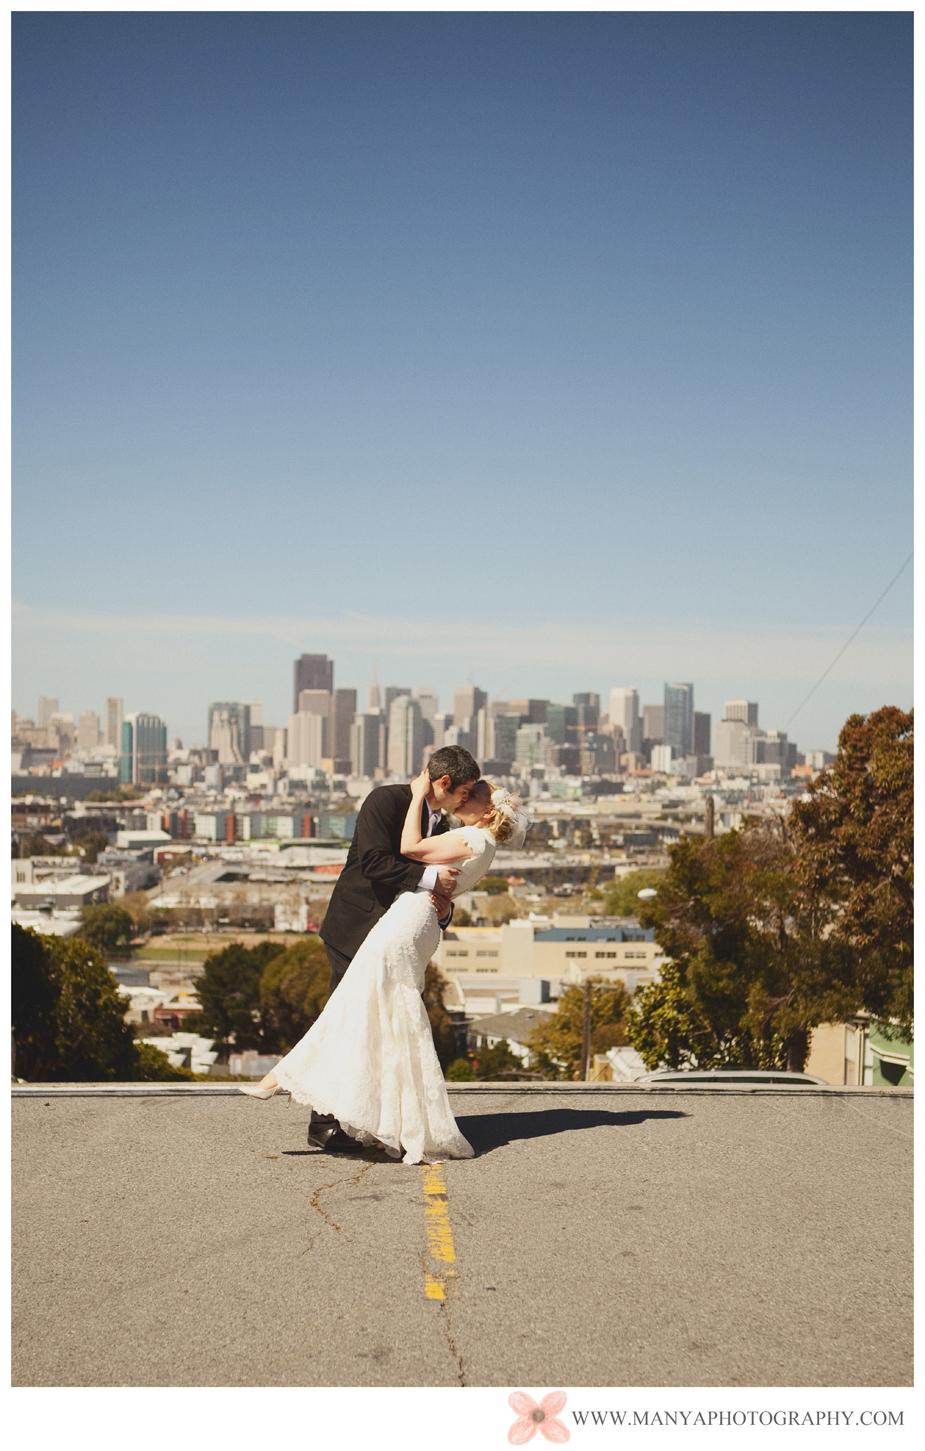 2013-07-08_0047 - Orange County Wedding Photographer